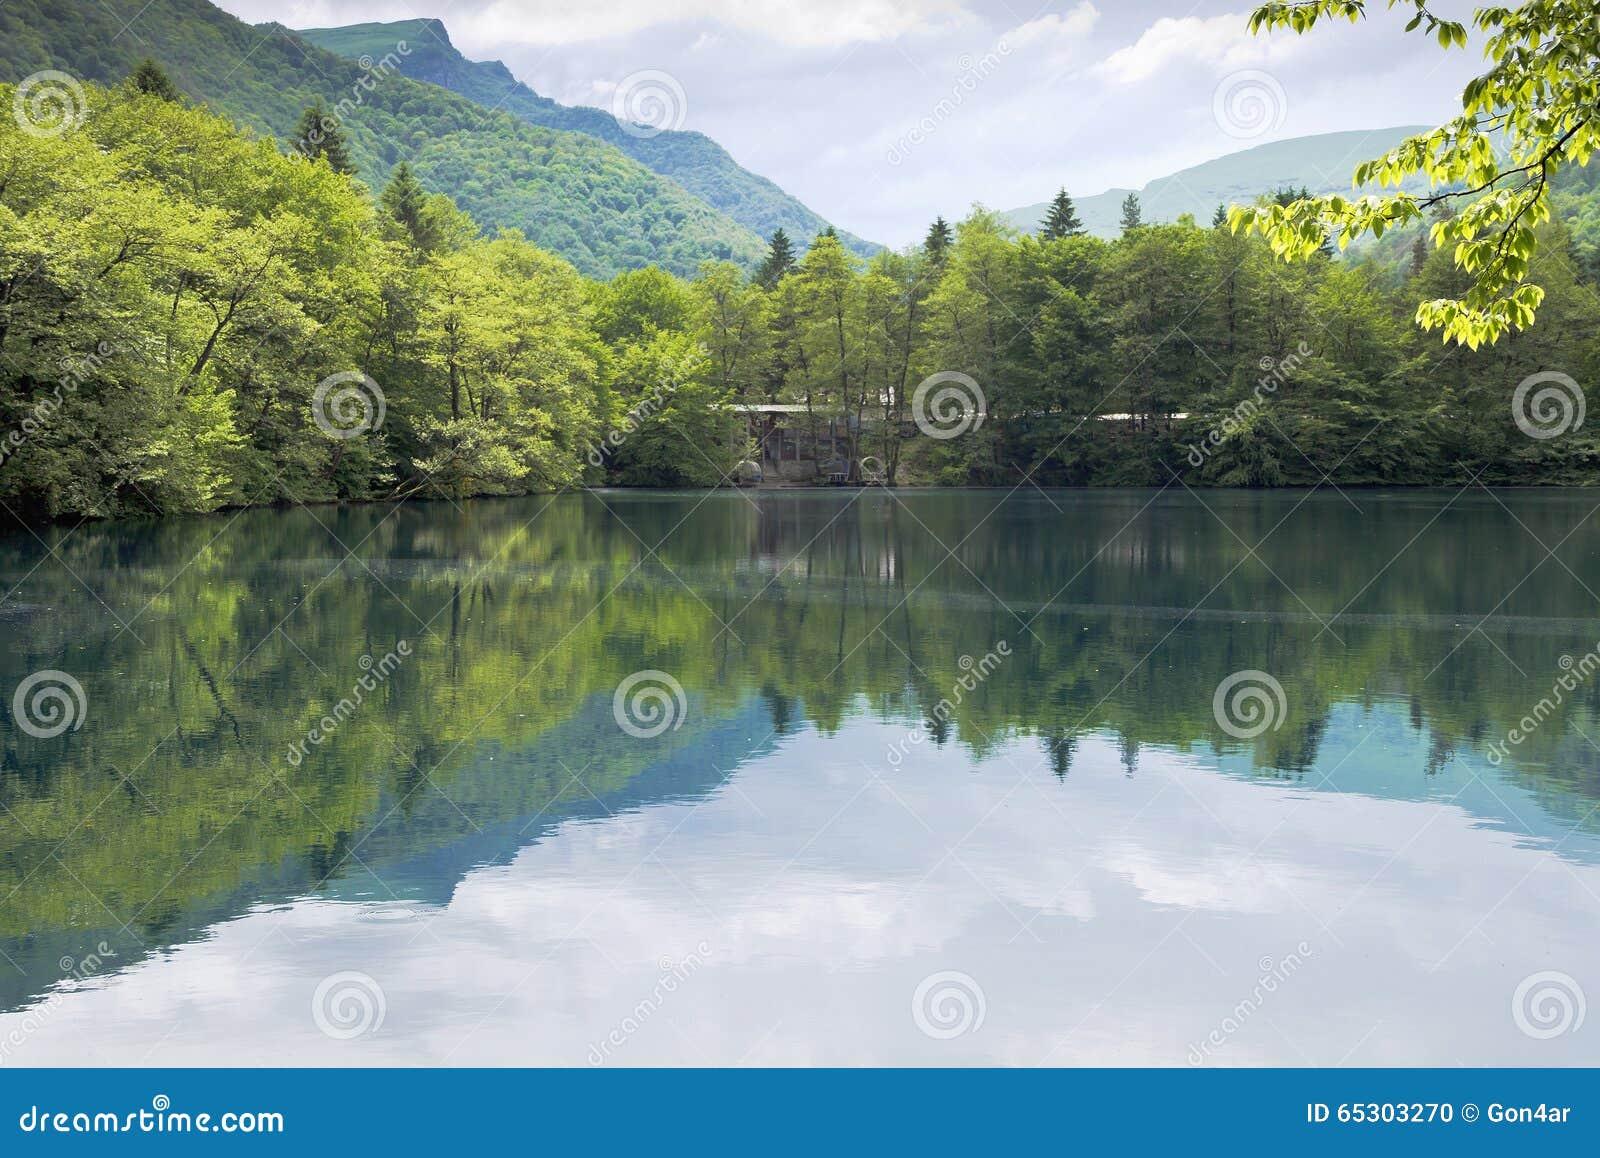 Kabardino-Balkaria. Blue Lakes where are located 17